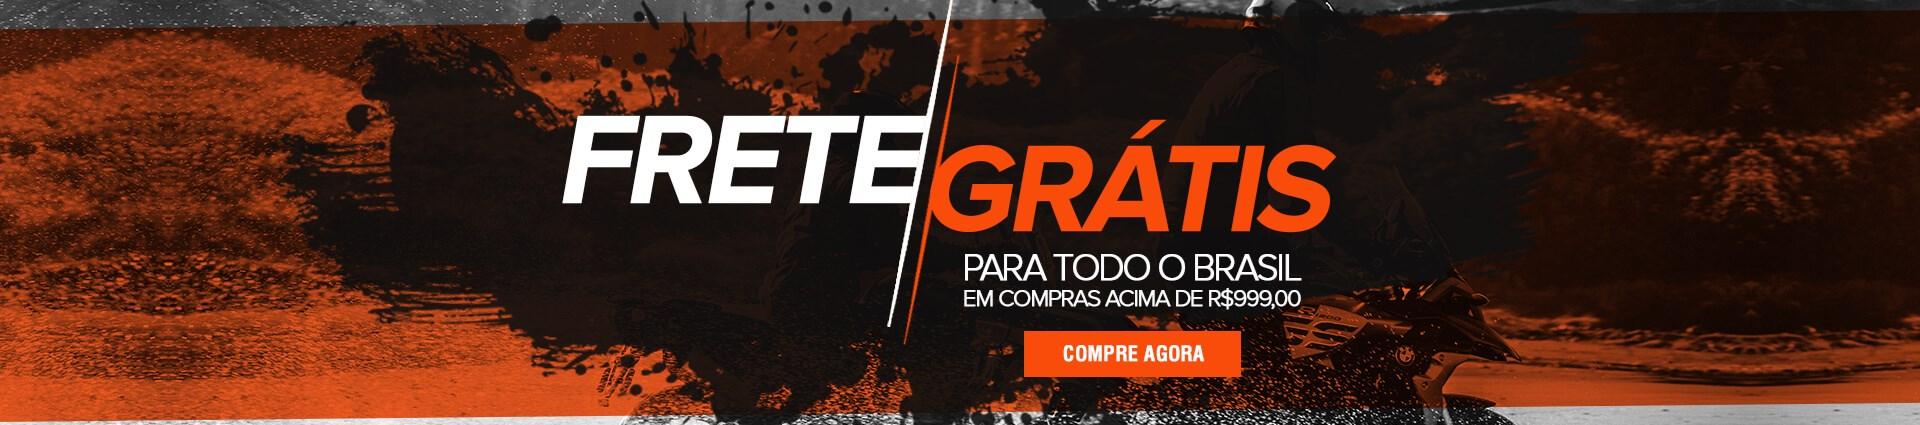 Banner Frete Grátis Desktop